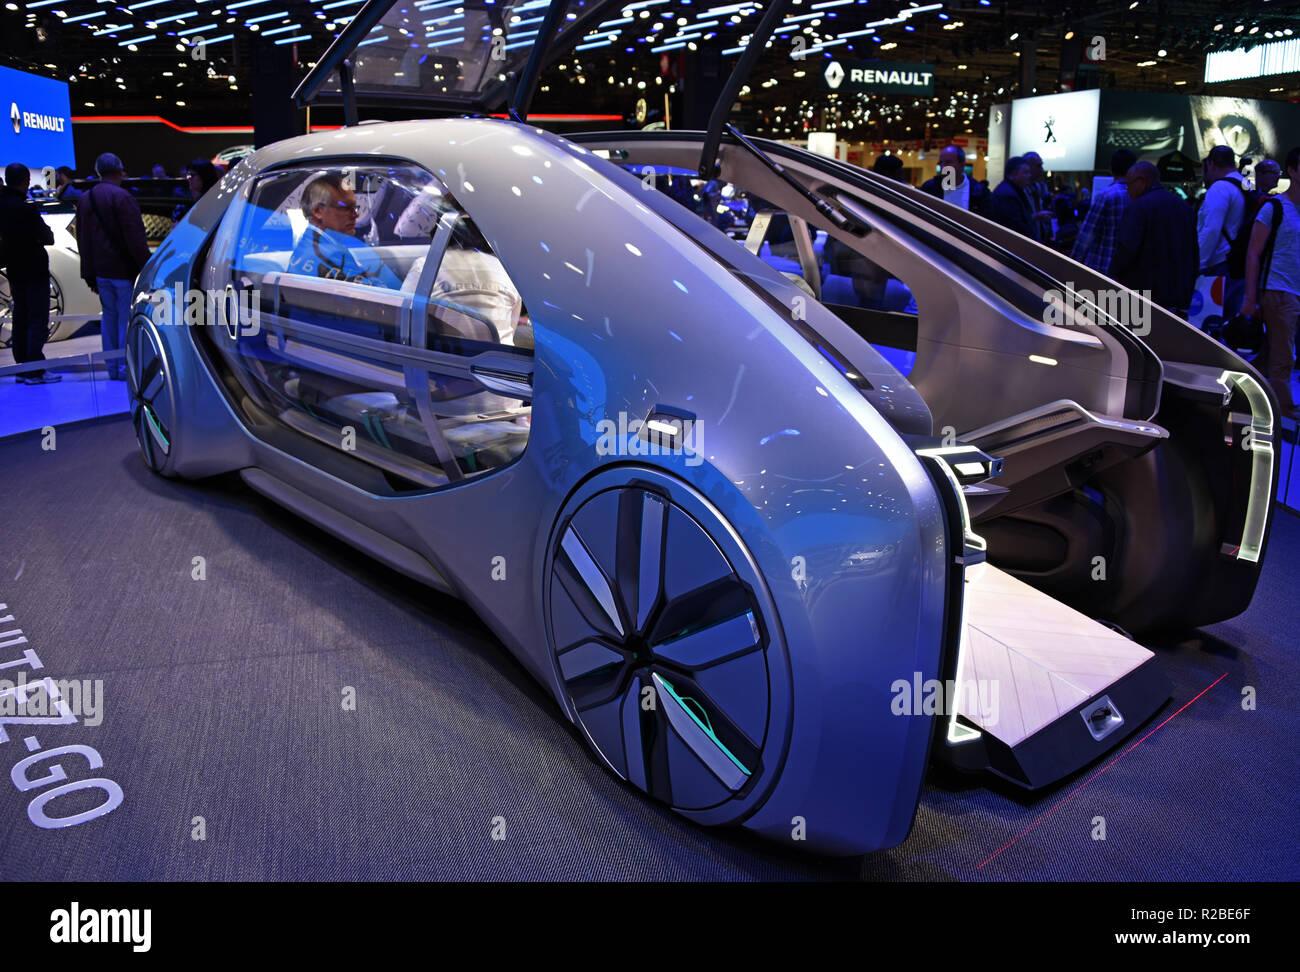 hight resolution of renault ez go concept car full electric mondial paris motor show paris france europe